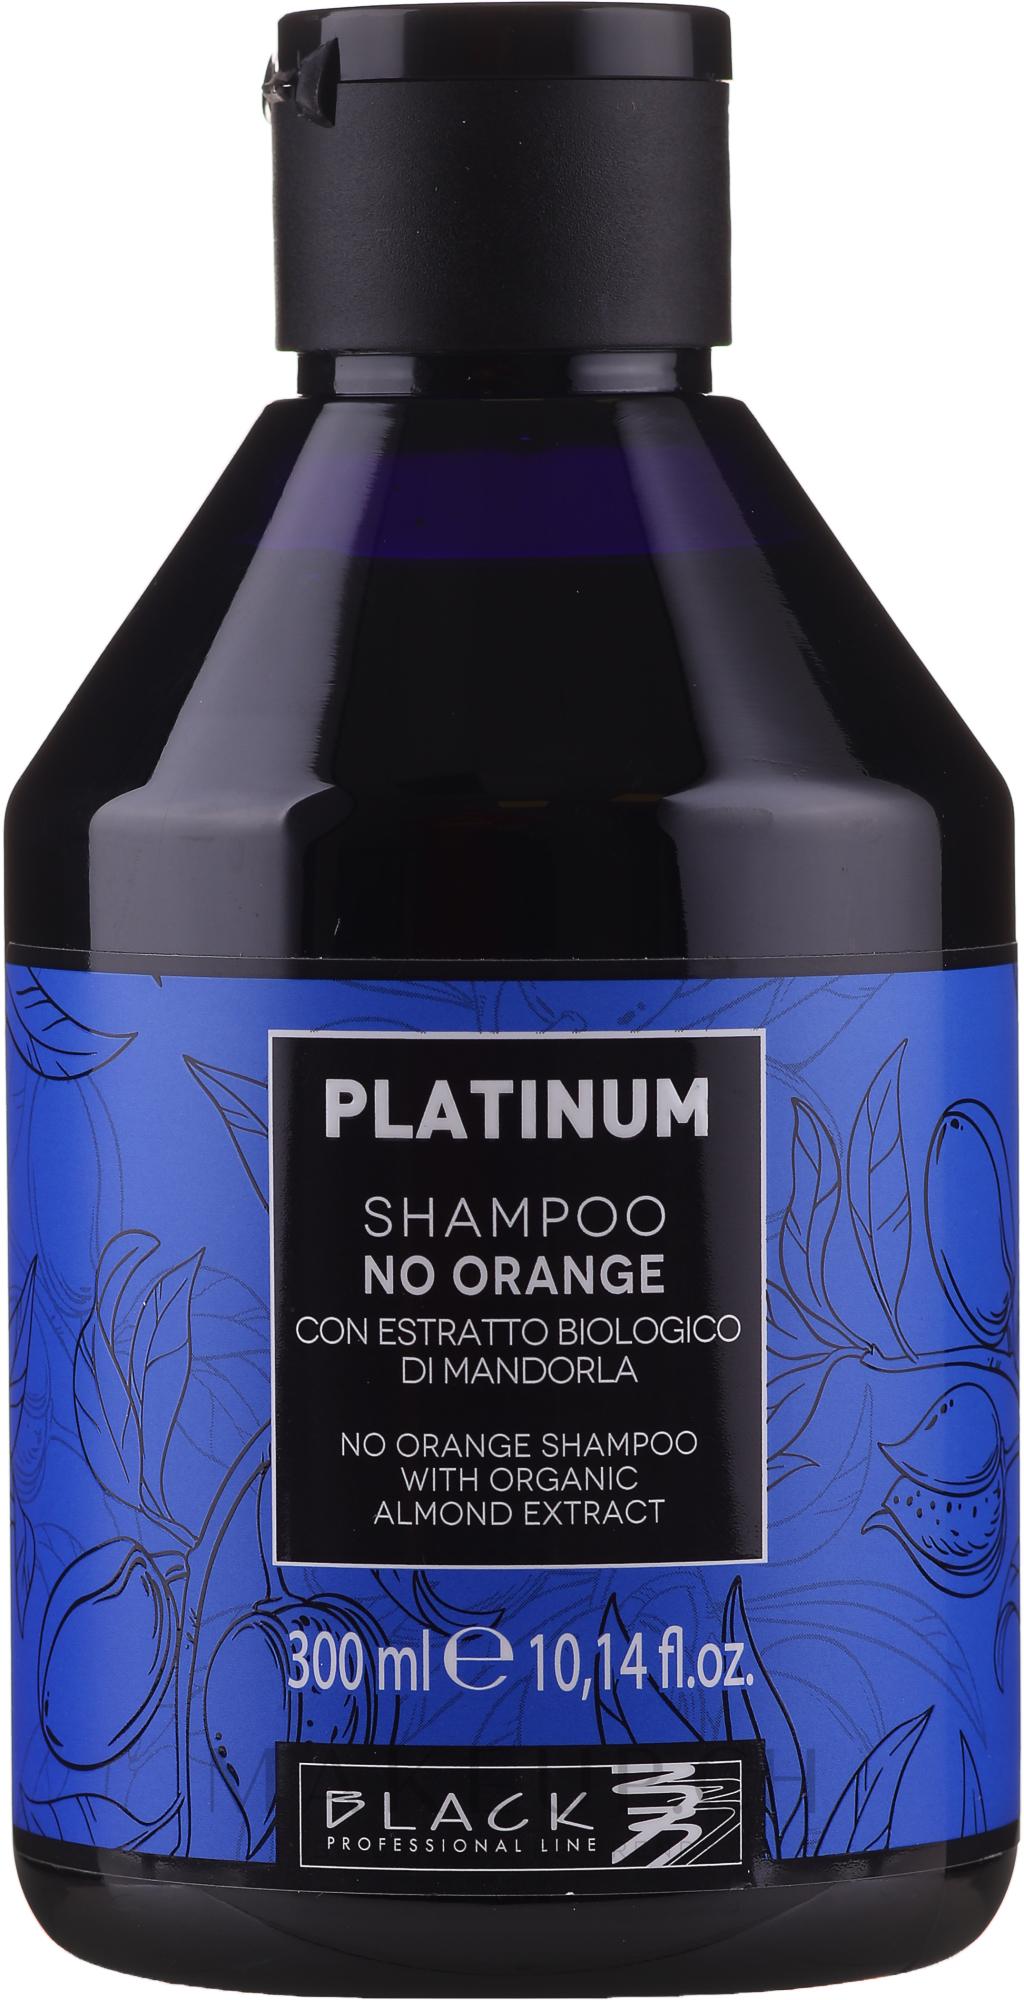 Anti-Orangestich Shampoo mit Bio Mandelextrakt - Black Professional Line Platinum No Orange Shampoo With Organic Almond Extract — Bild 300 ml